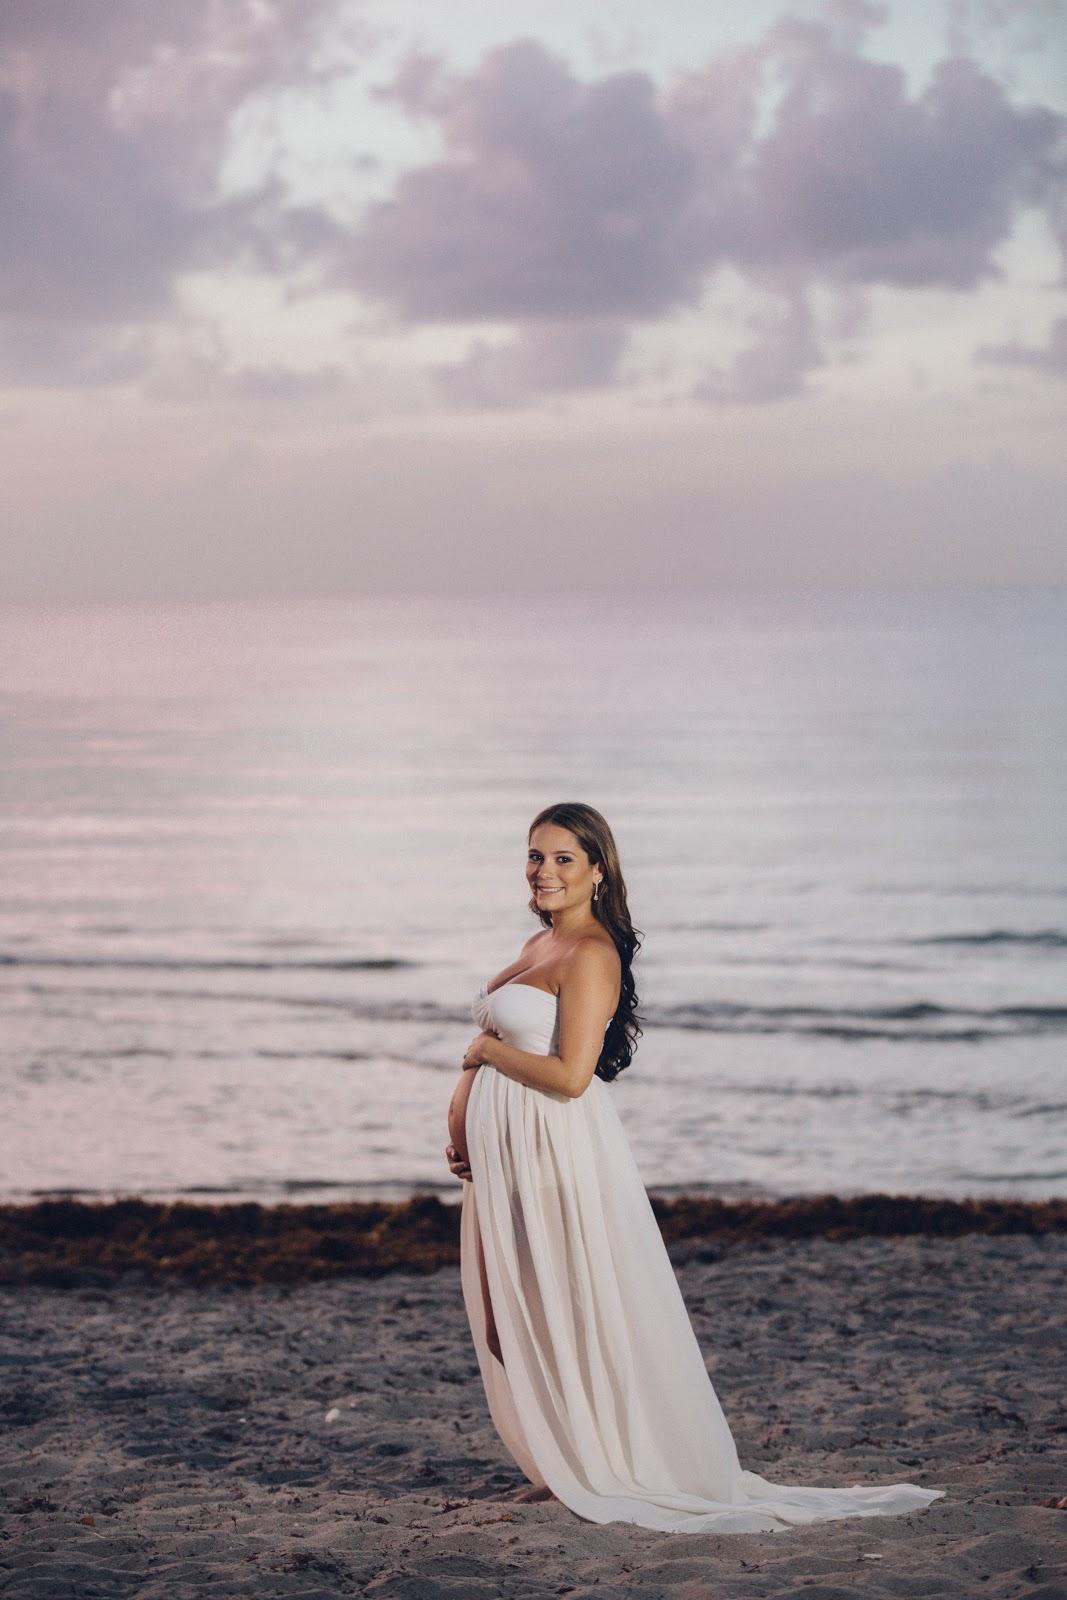 Laura Amp Co Maternity Photoshoot Beach Sunrise Look